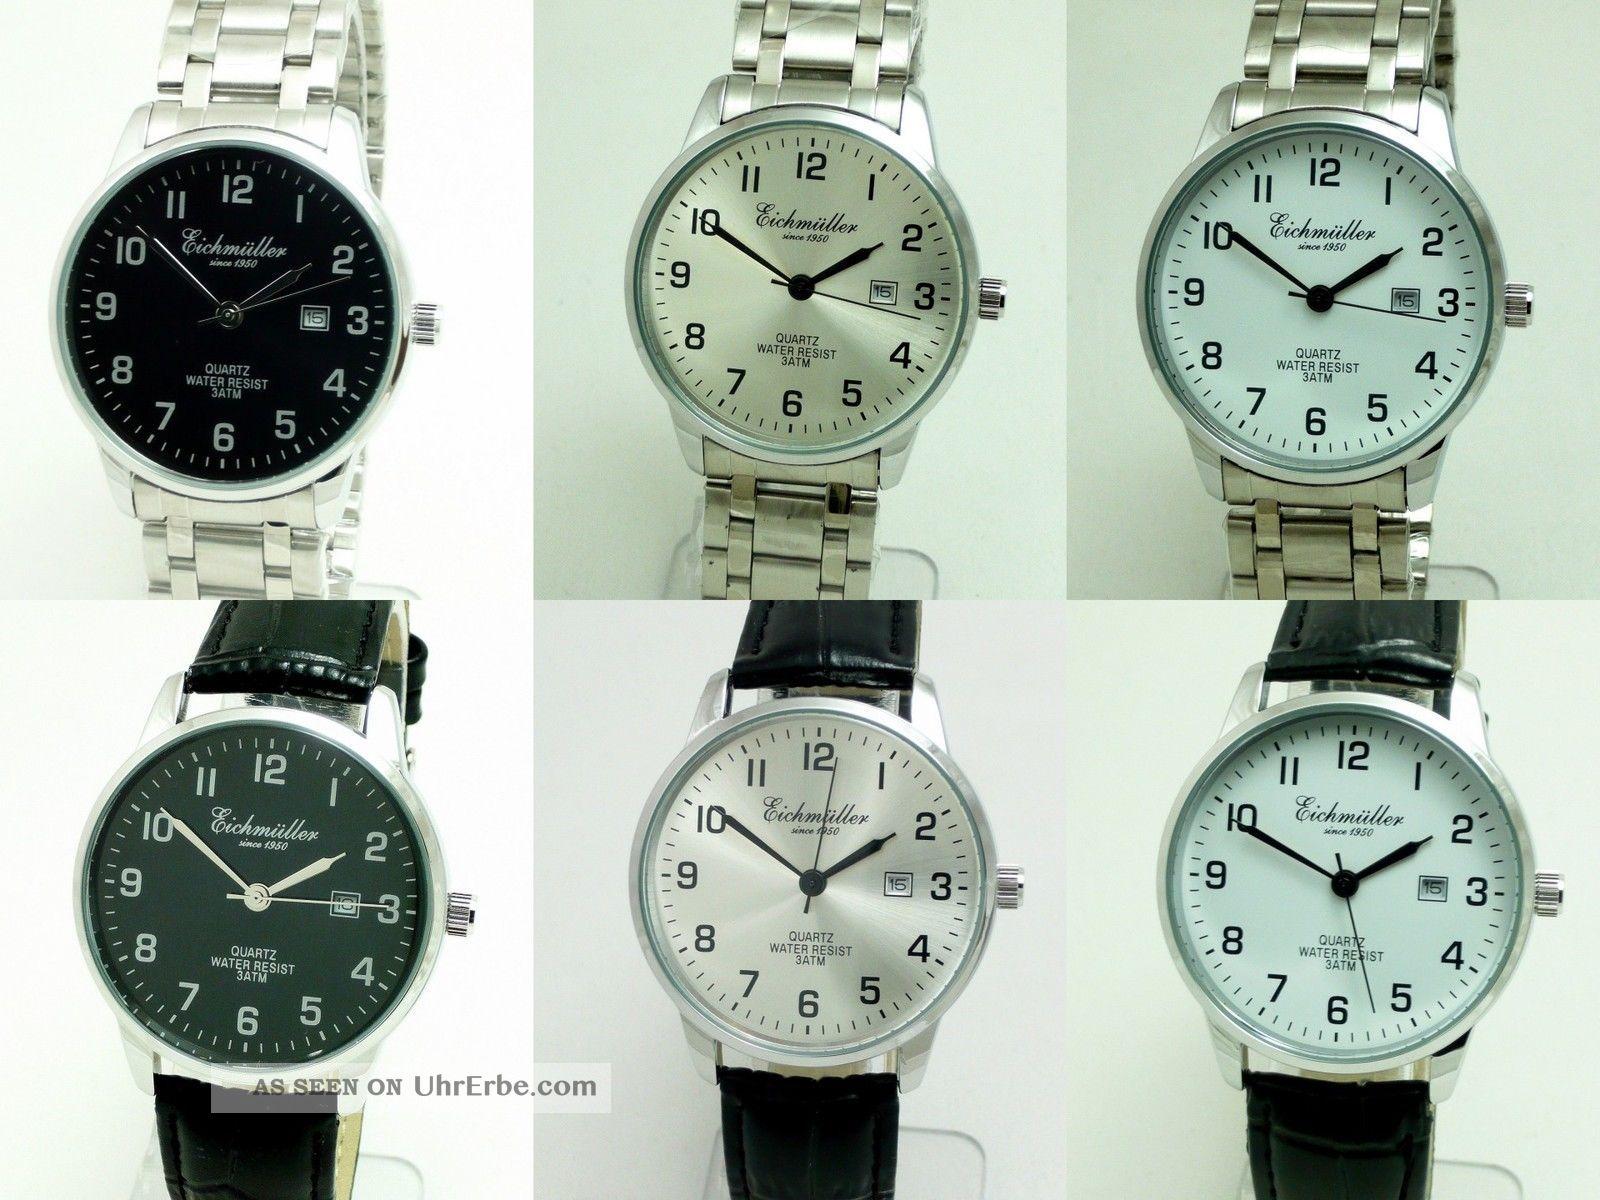 Eichmüller Damenuhr Leder Oder Metallband Classic Datum Verschiedene Modelle Armbanduhren Bild